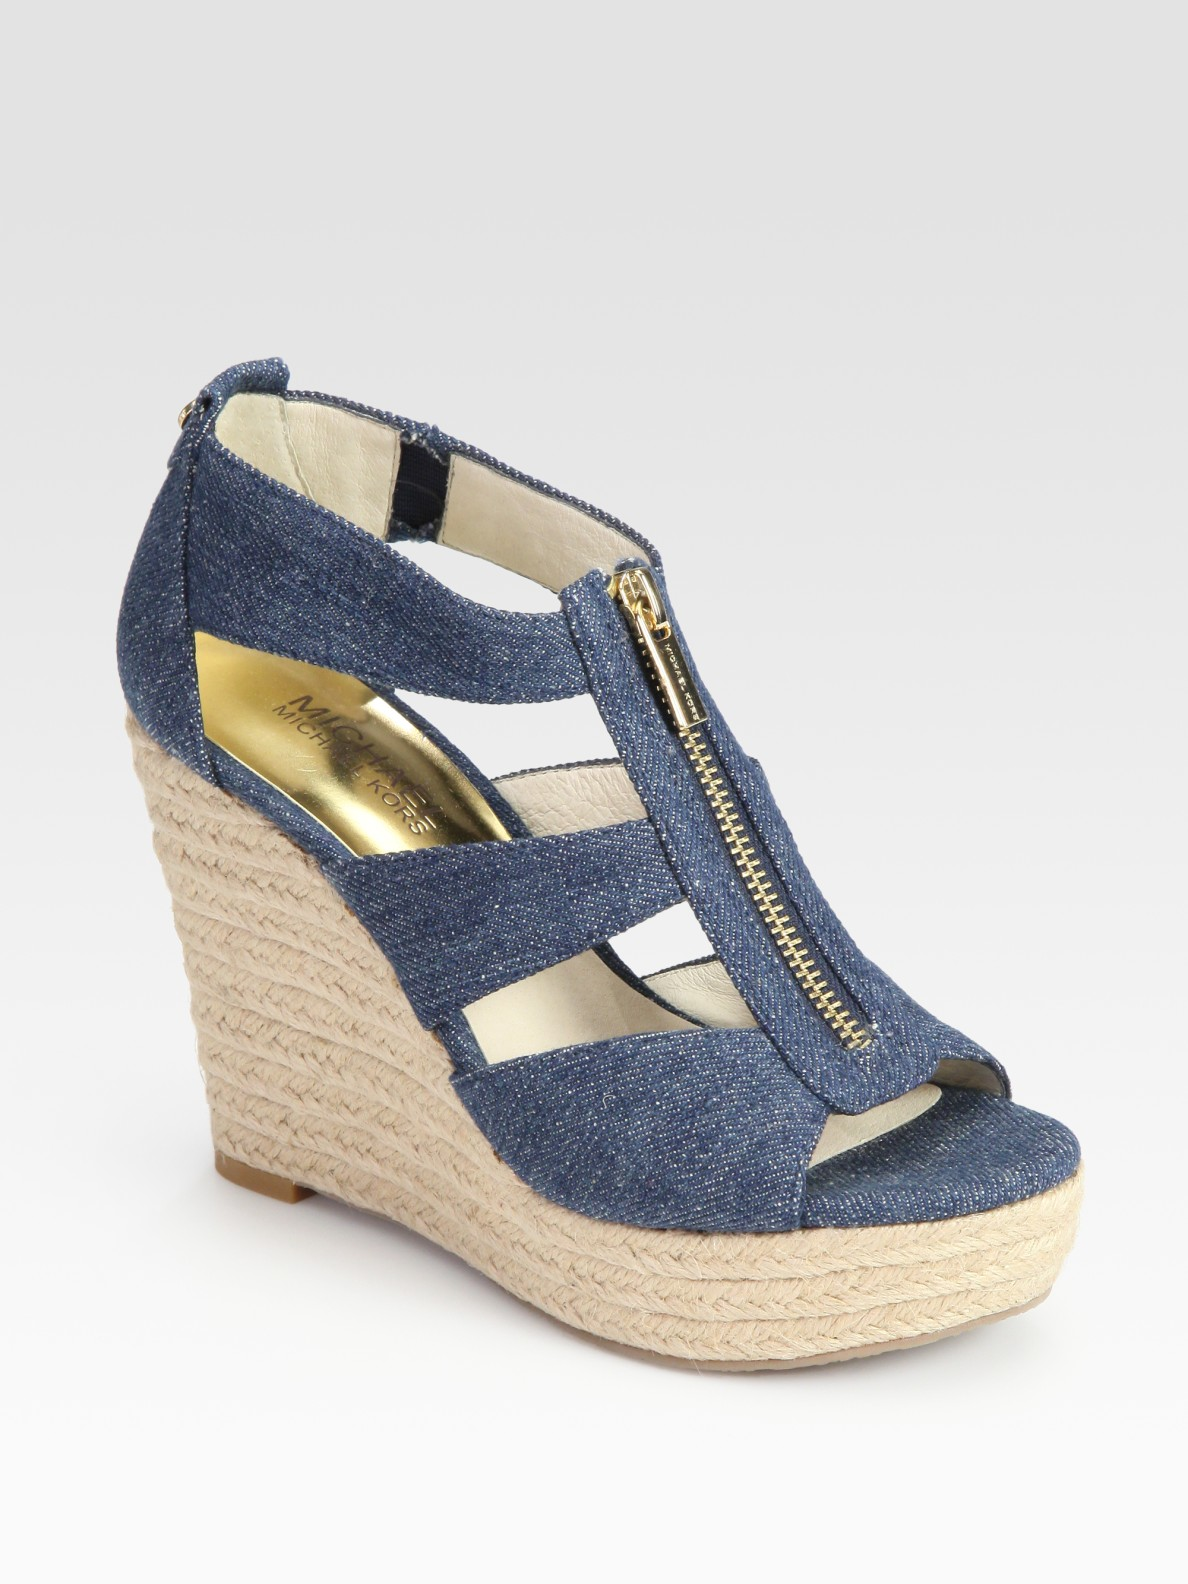 2ac03419684 Lyst - MICHAEL Michael Kors Damita Espadrille Wedge Sandals in Blue